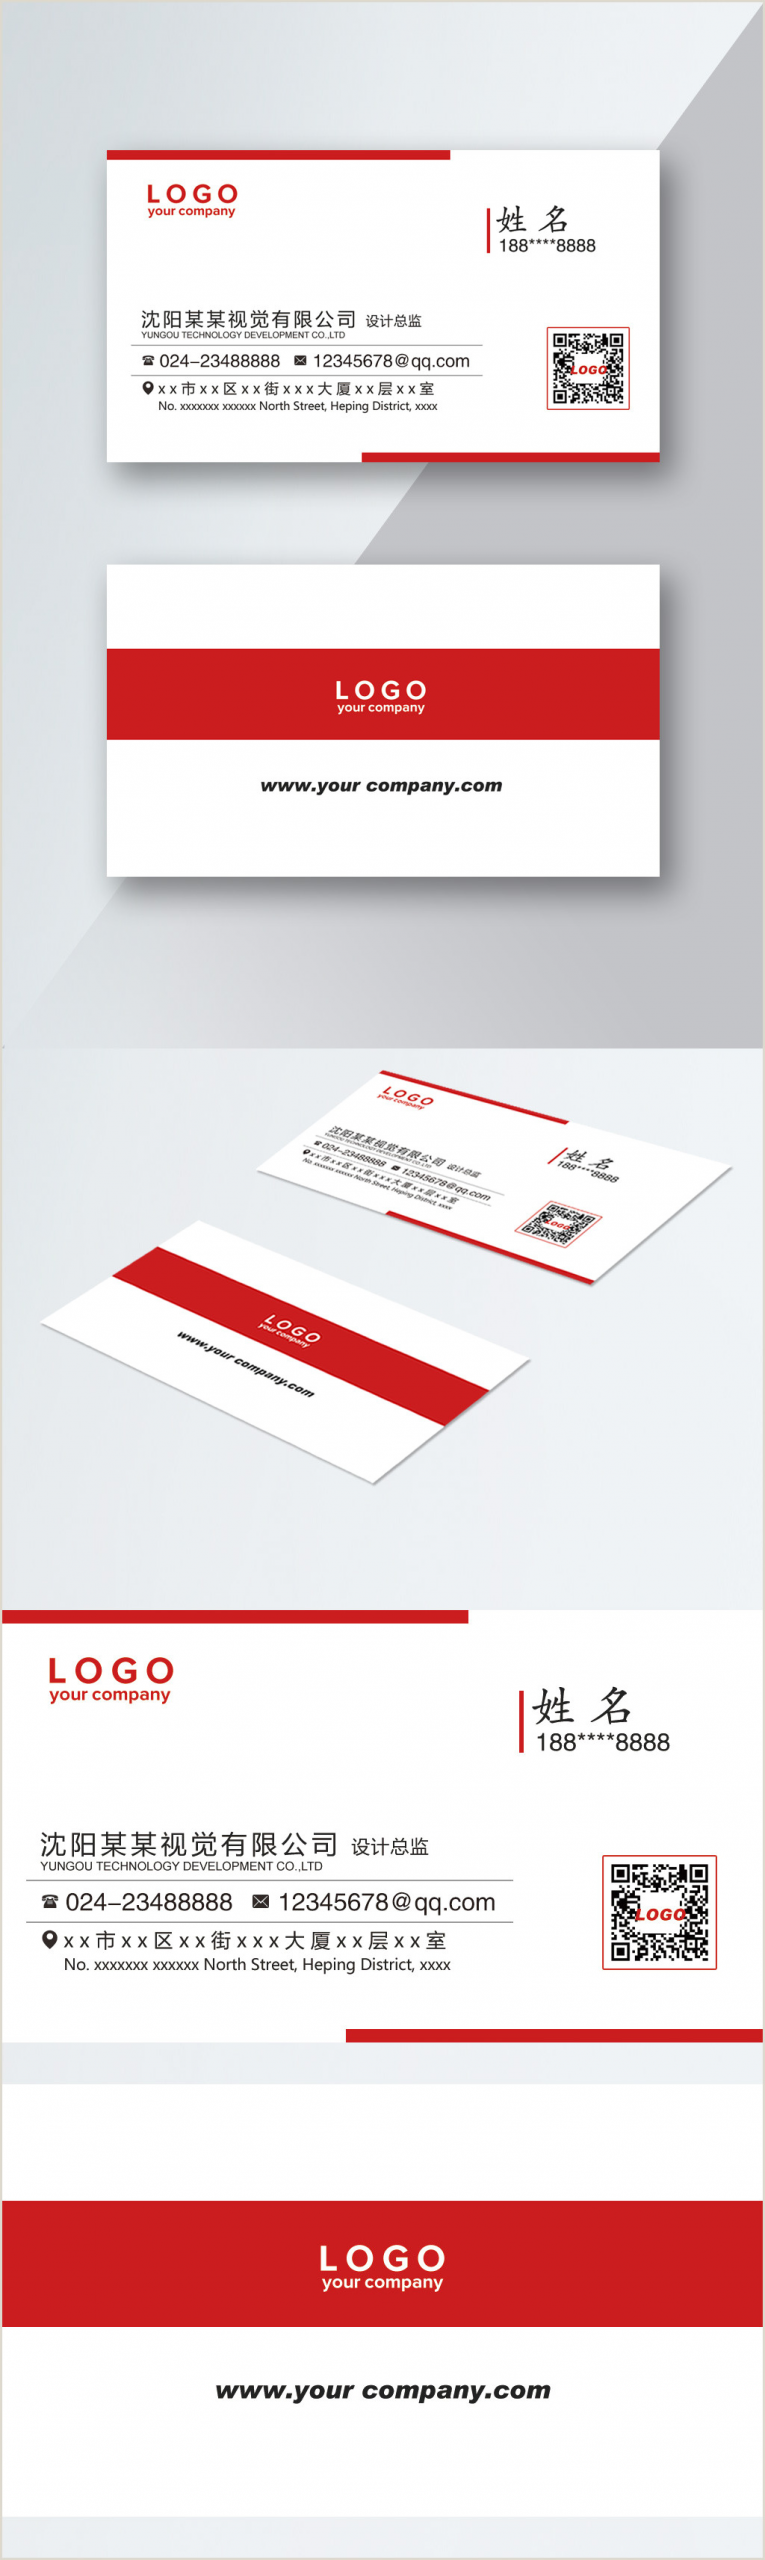 Personal Business Card Design Designers Personal Business Card Design Template